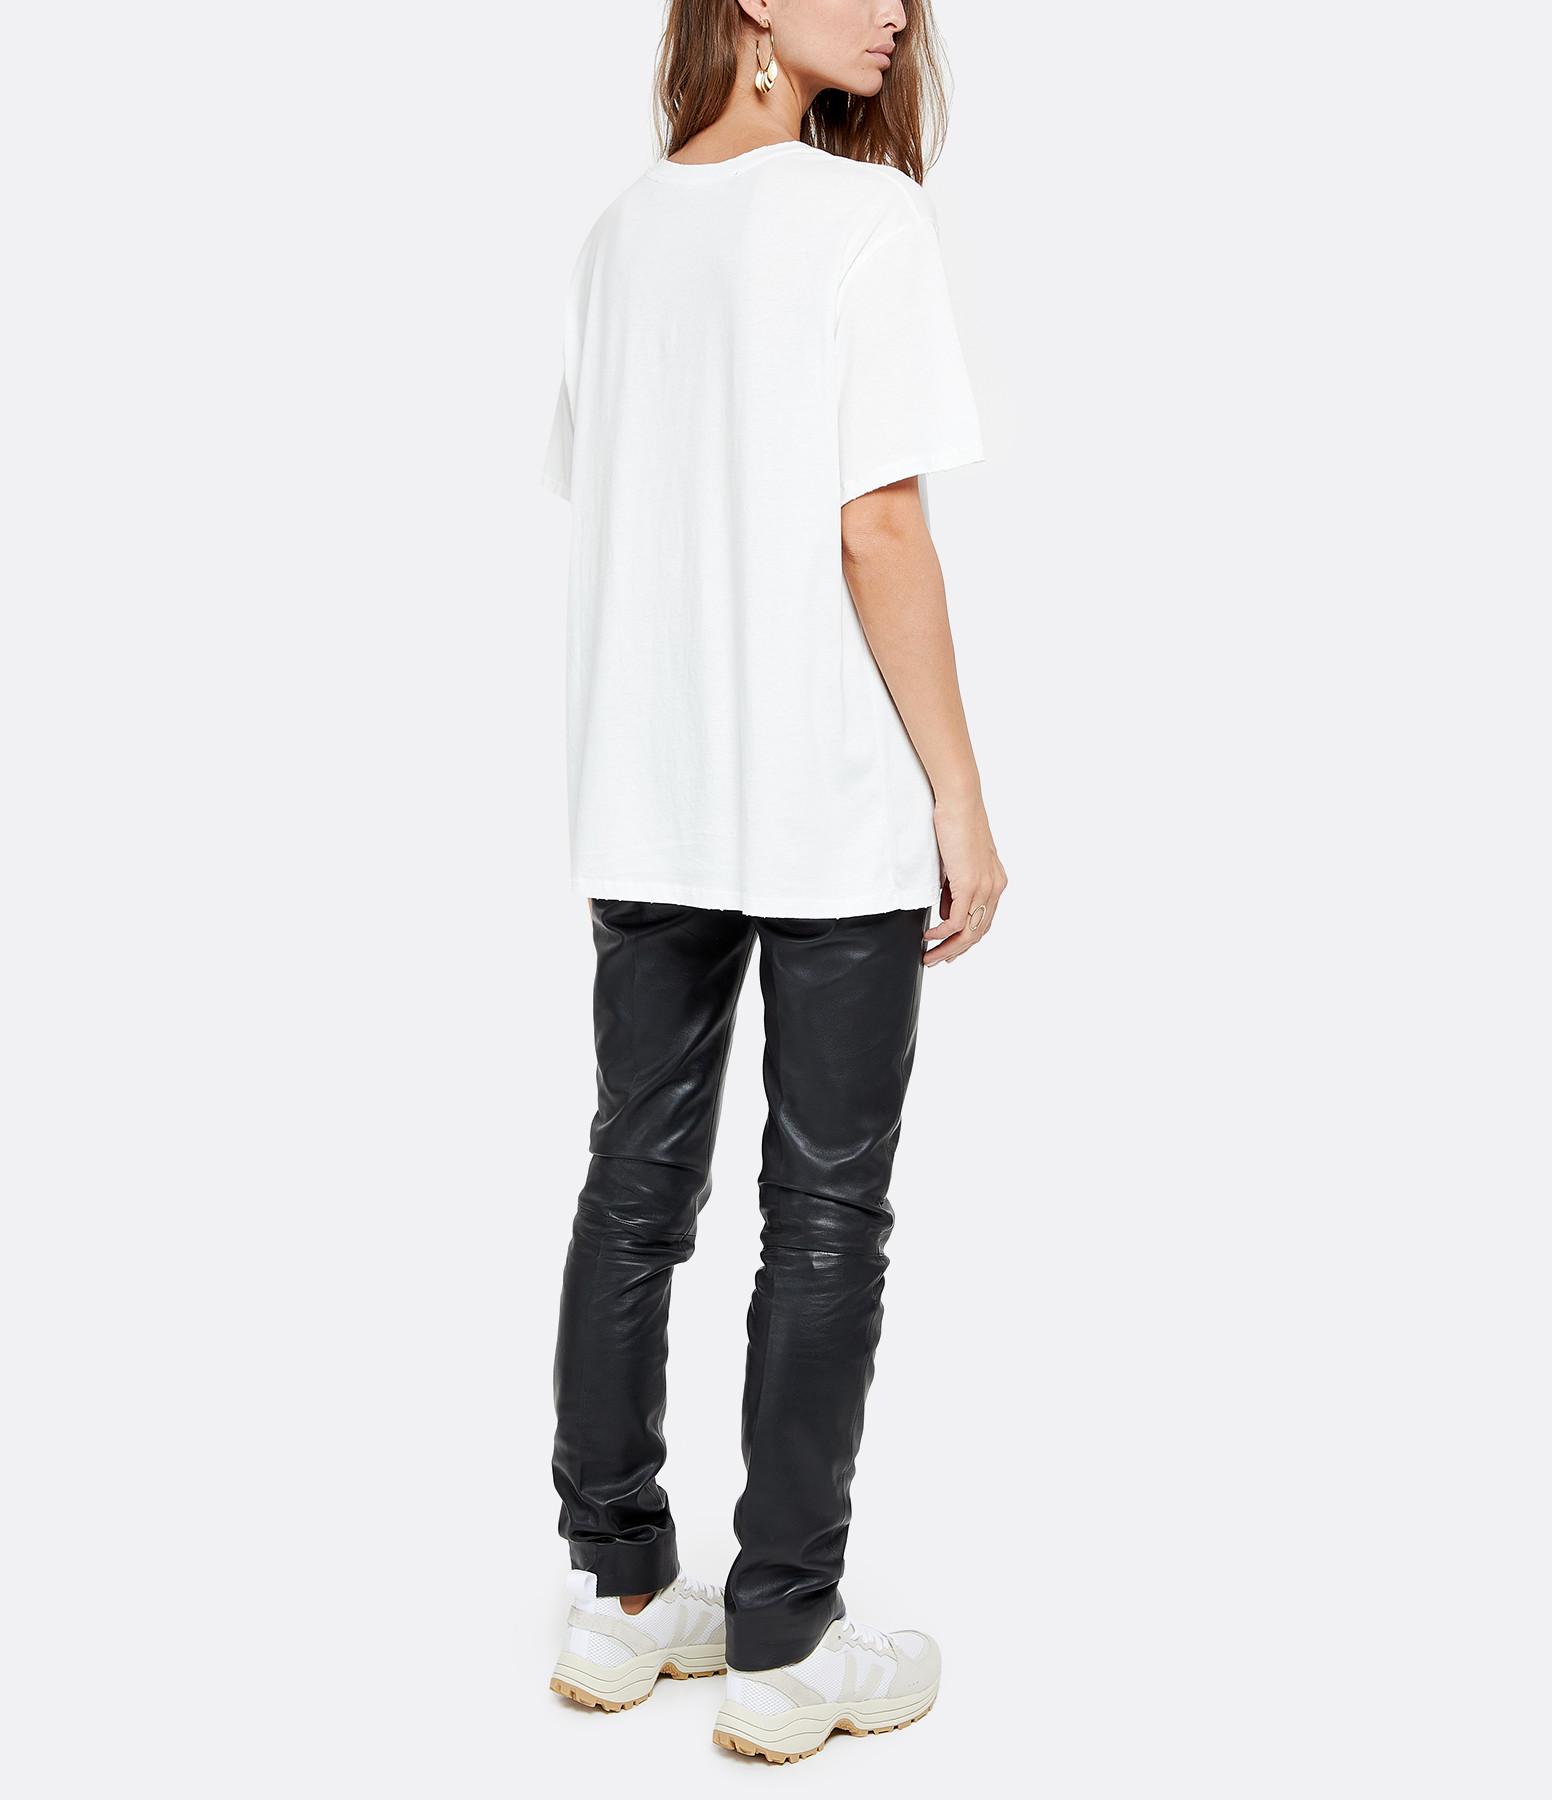 GARCONS INFIDELES - Tee-shirt University Blanc